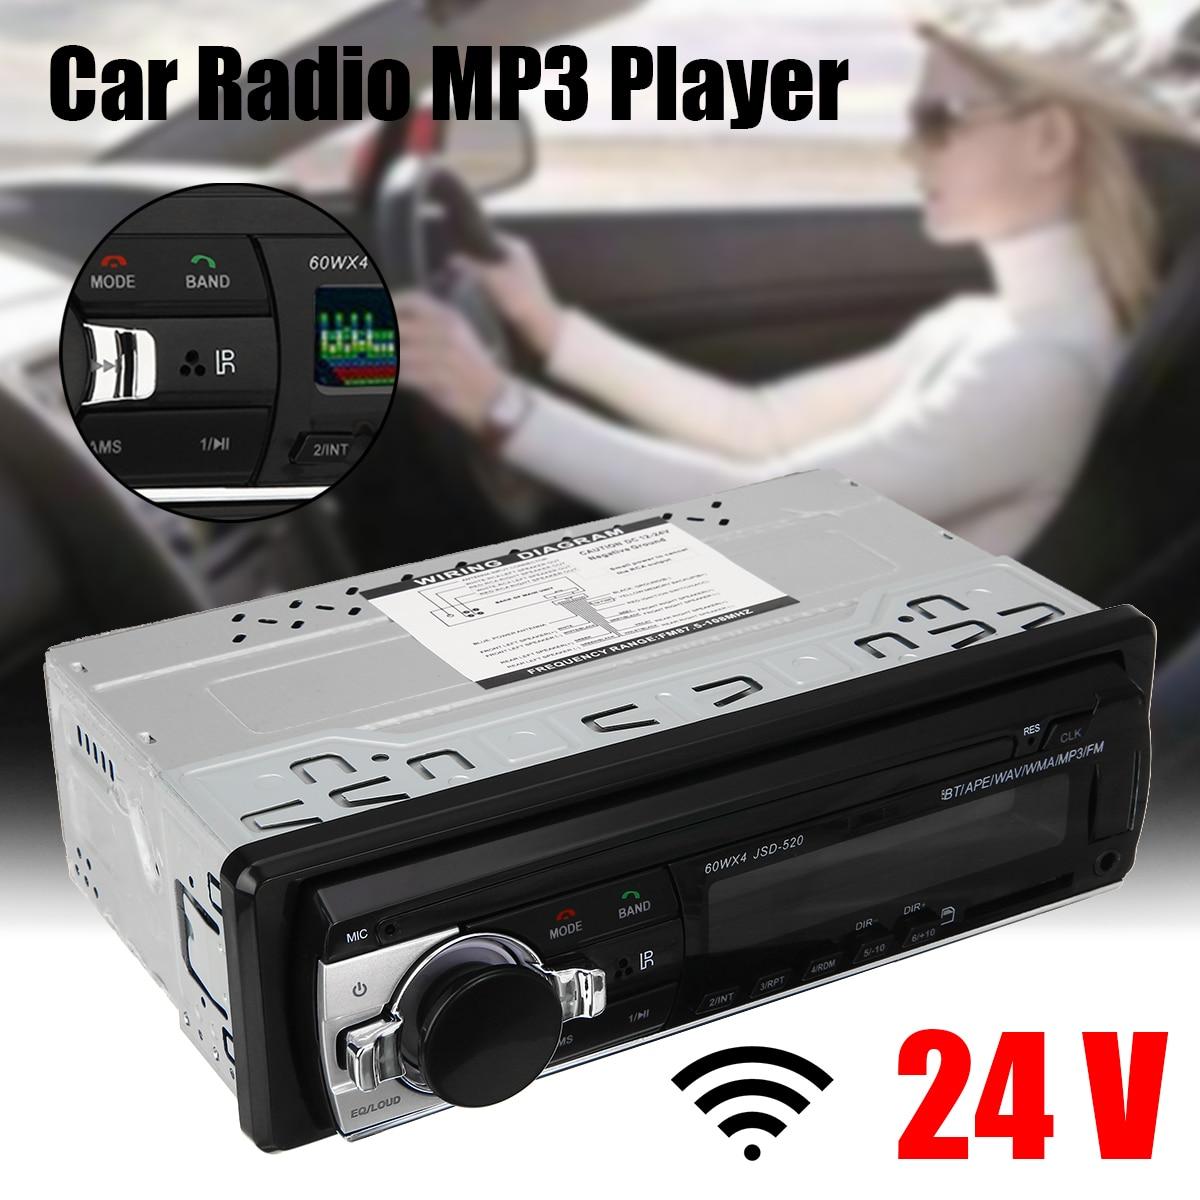 car stereo amplifier dc12v ac220v bluetooth 2ch hi fi car stereo audio power amplifier digital player usb sd fm dvd for car auto JSD-520 24V Car Radio Stereo Player Digital bluetooth Car MP3 Player 60Wx4 FM Radio Stereo Audio USB/SD with In Dash AUX Input